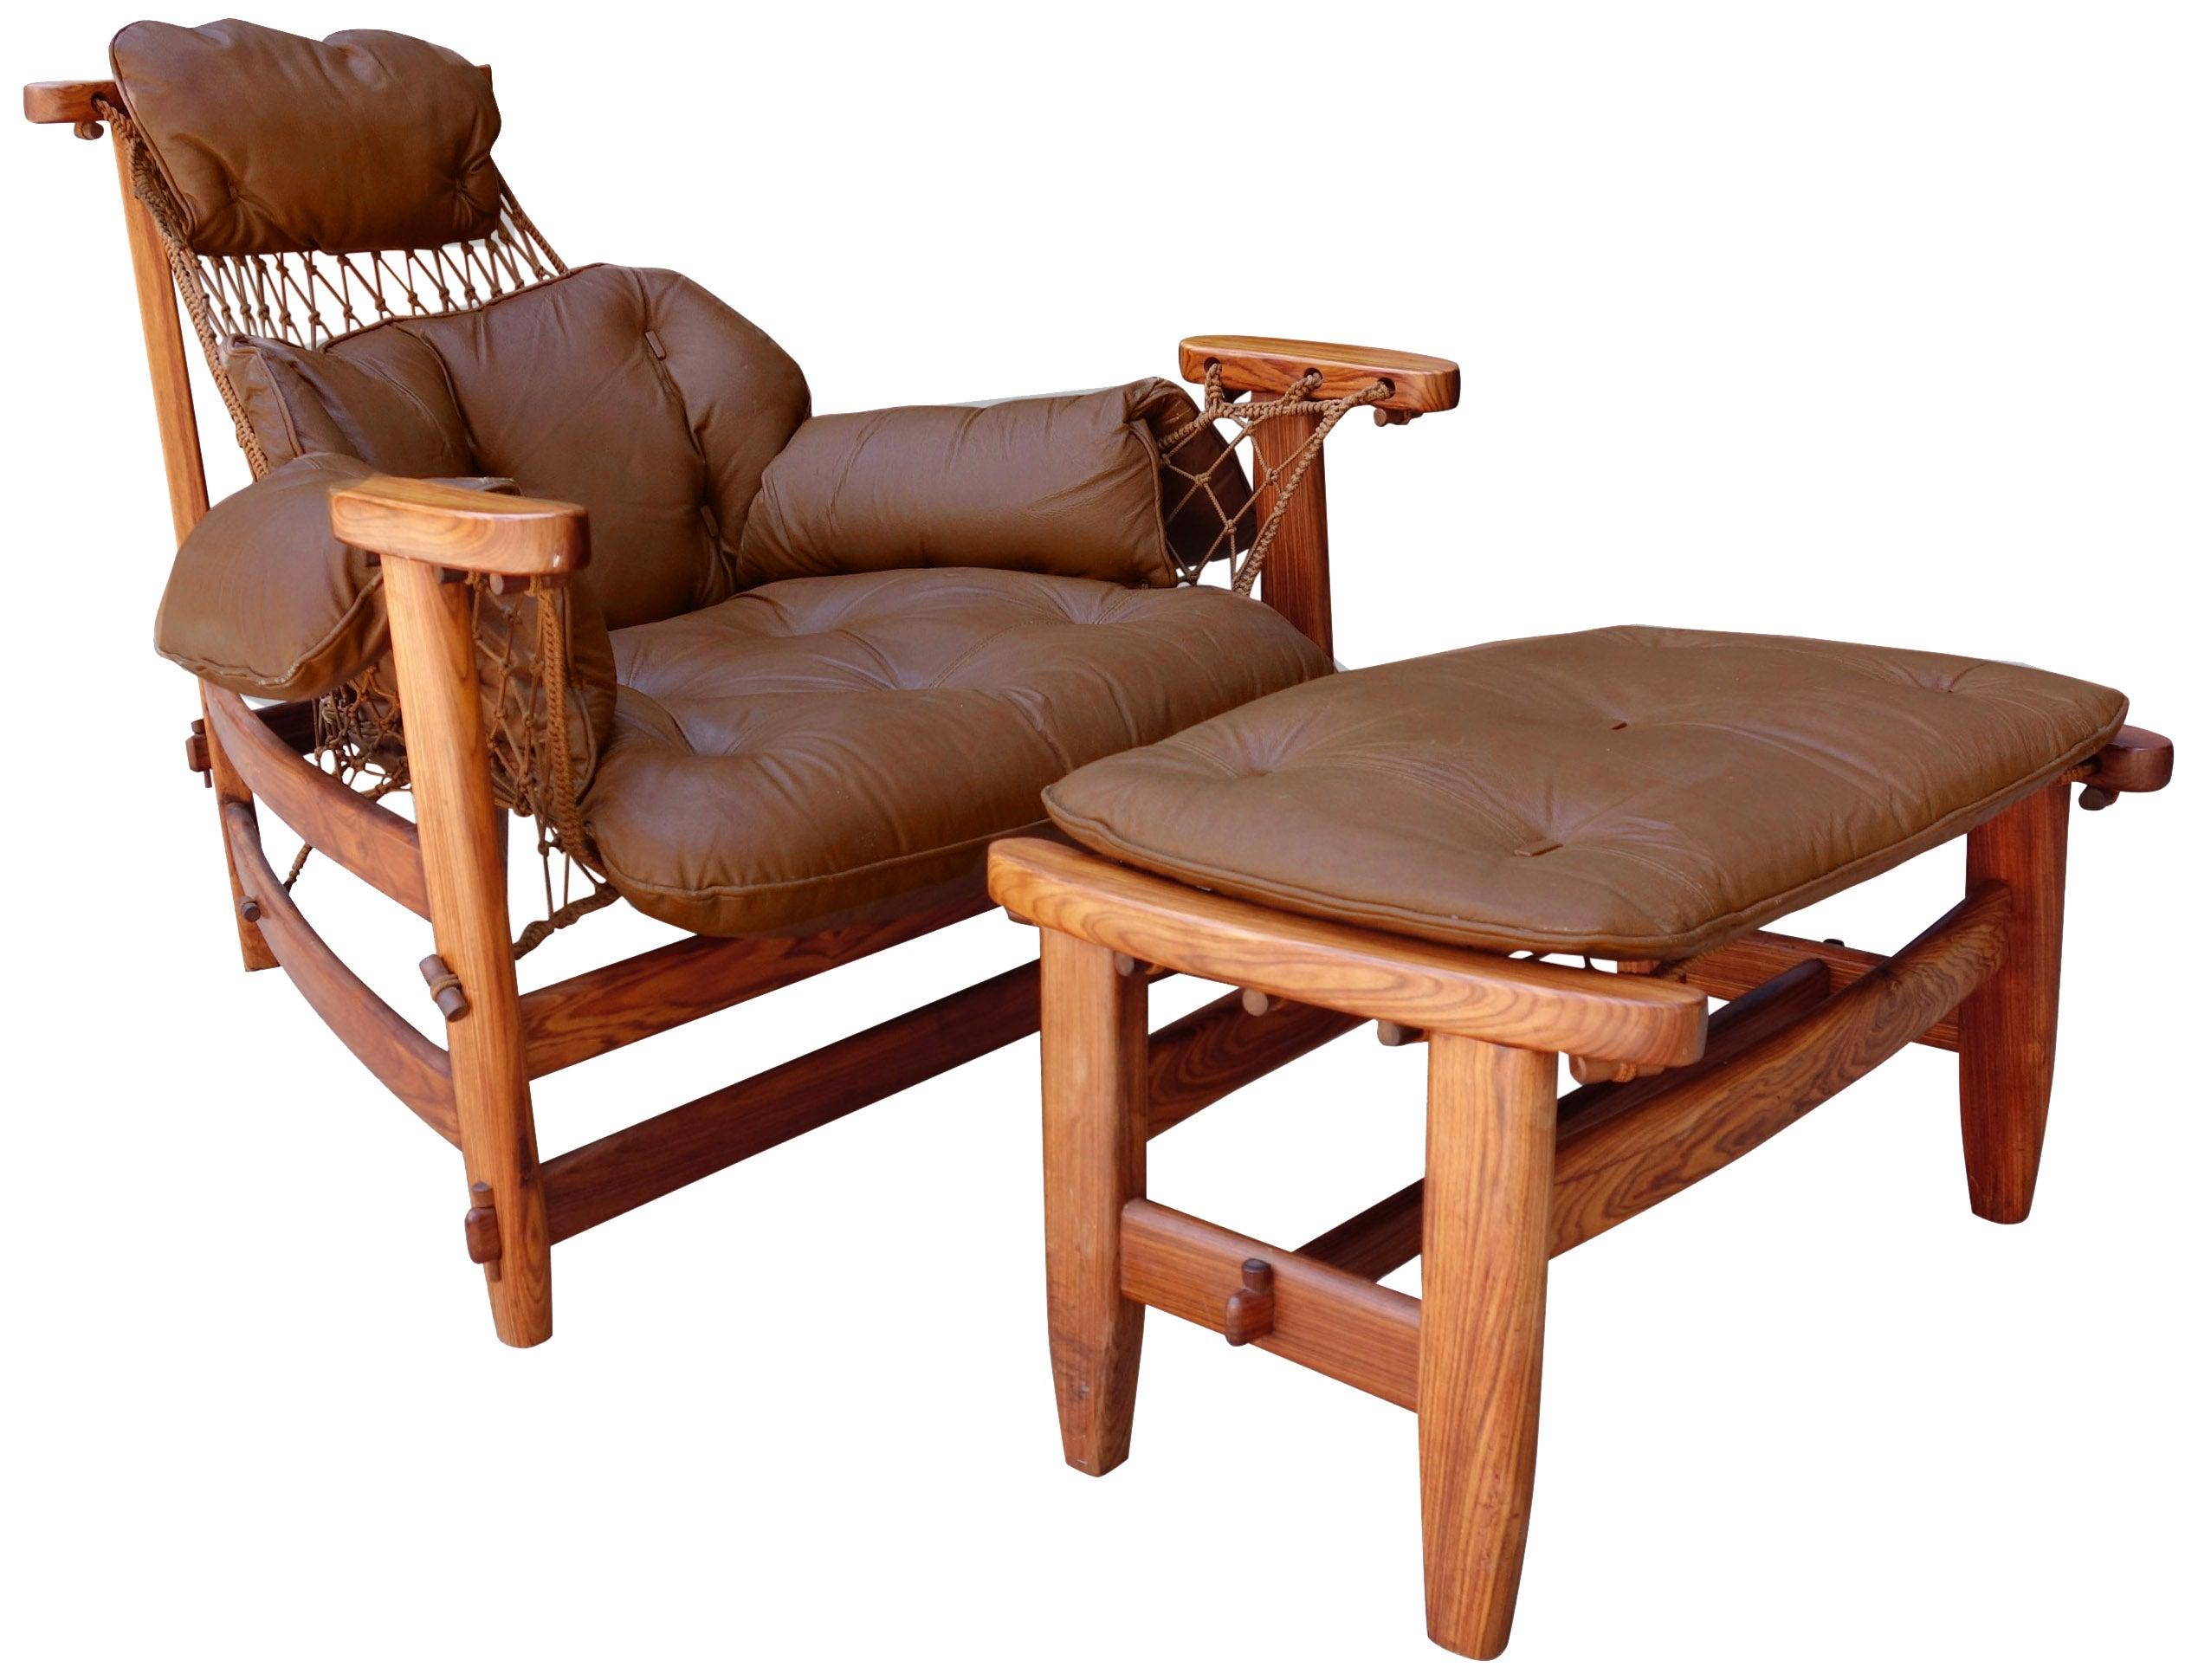 Midcentury Brazilian Lounge Chair by Jean Gillon